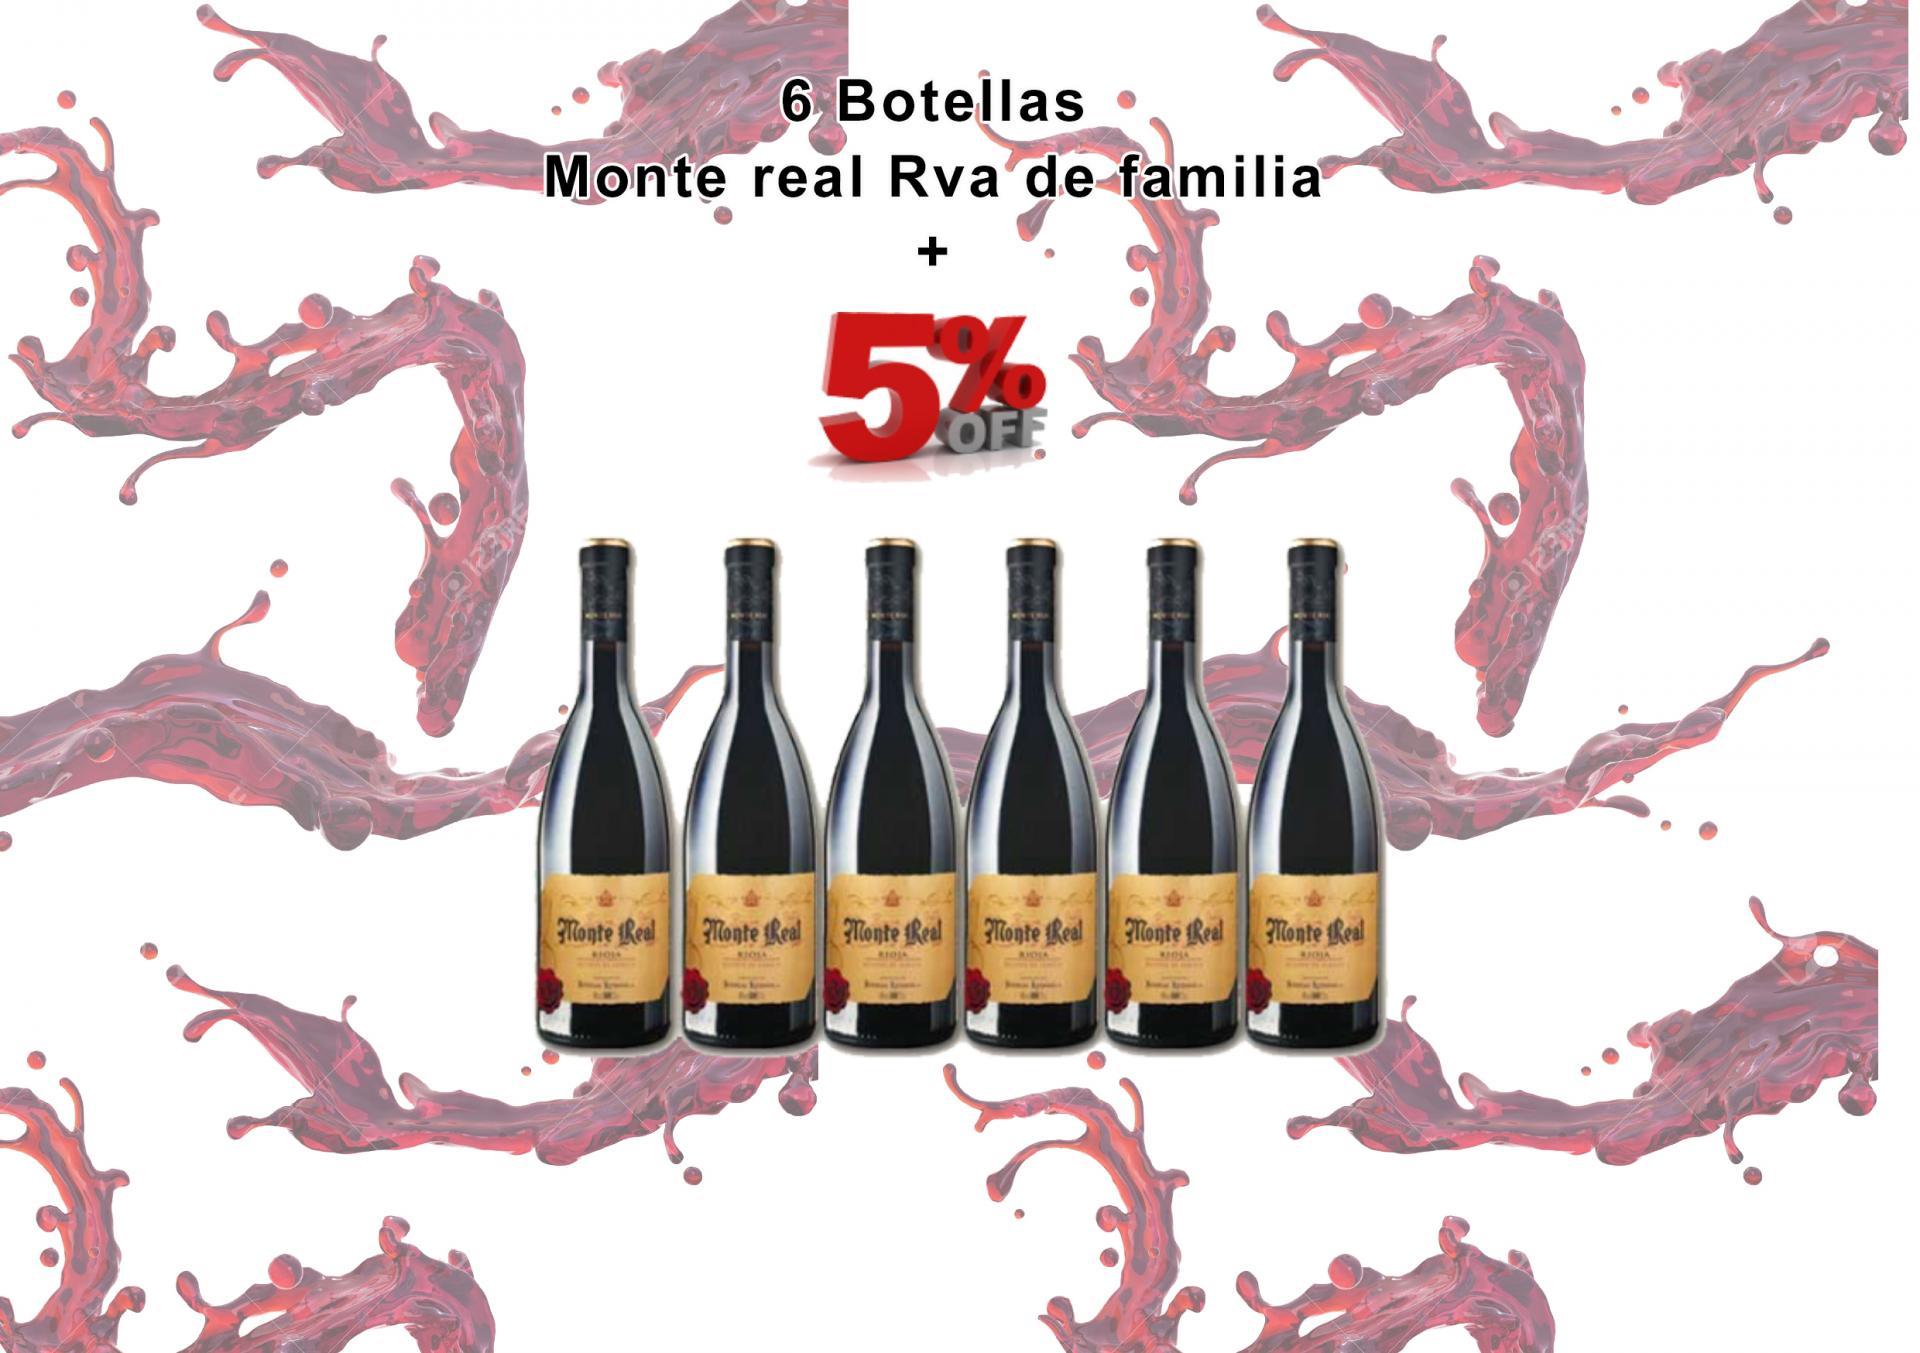 OFERTA - 6 Botellas Monte Real Rva de Familia - 5% de DESCUENTO